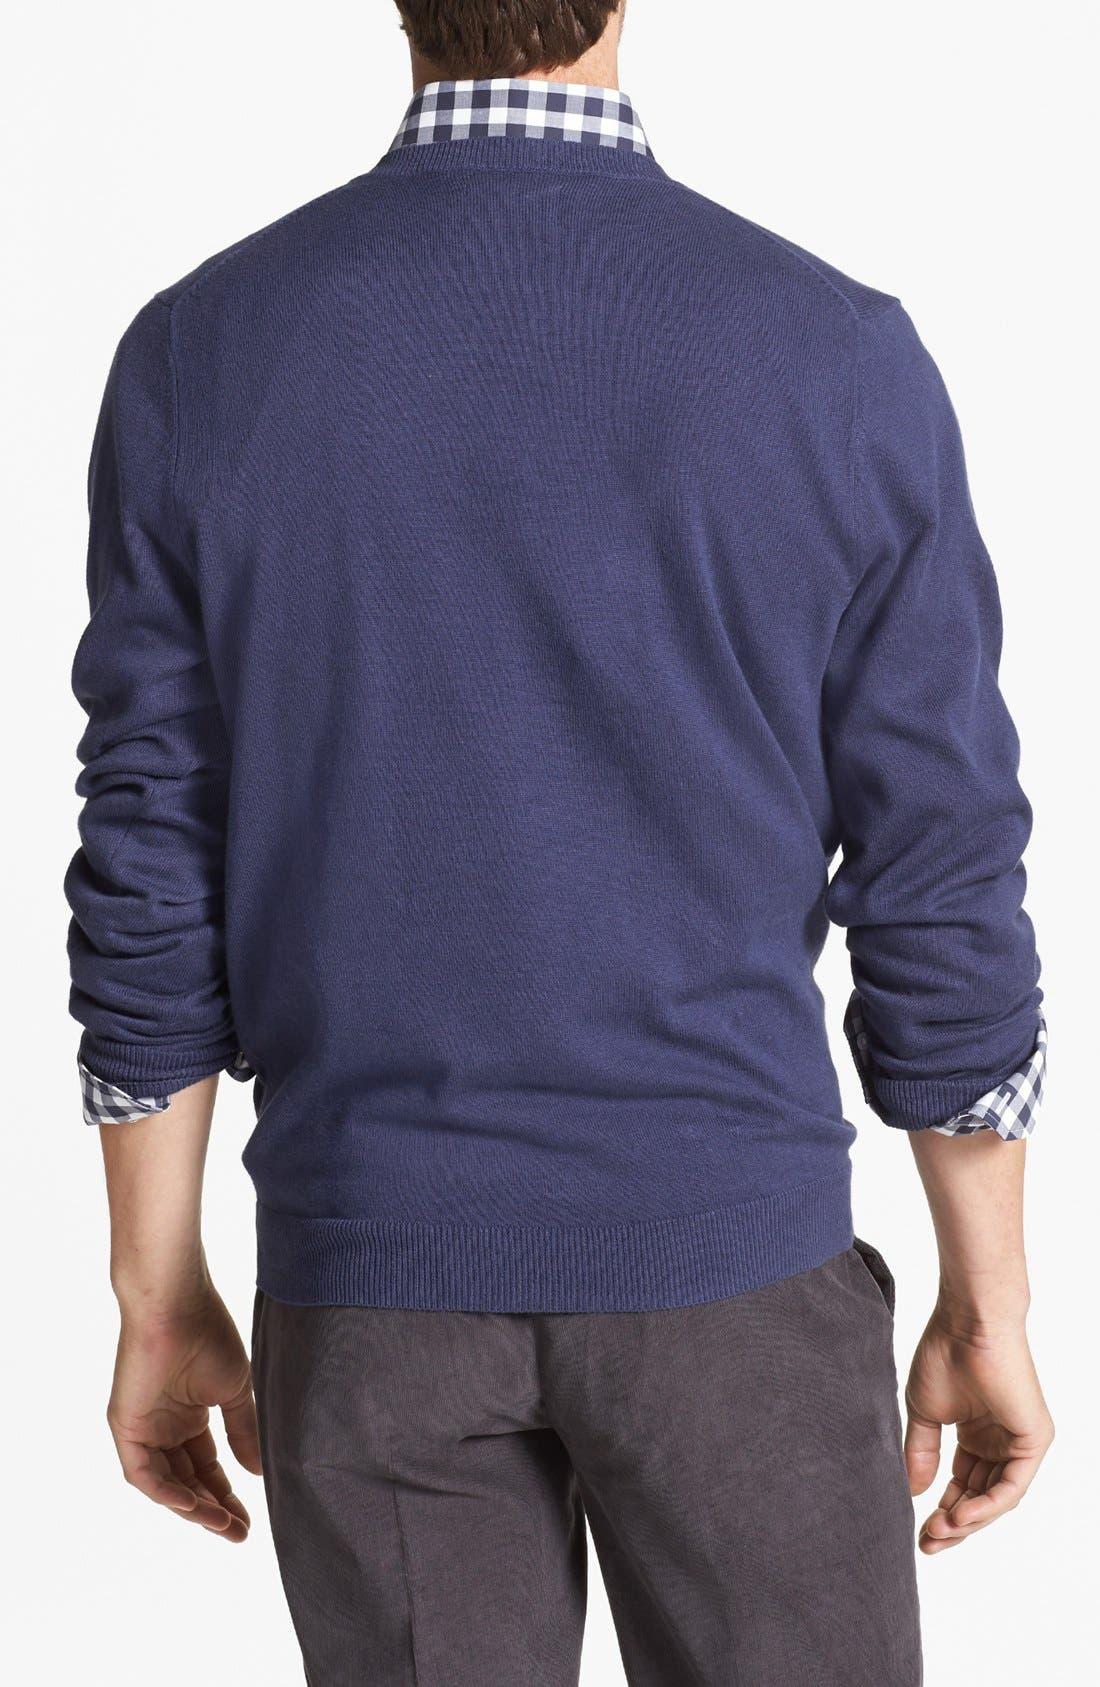 Alternate Image 2  - Wallin & Bros. Trim Fit V-Neck Cotton & Cashmere Sweater